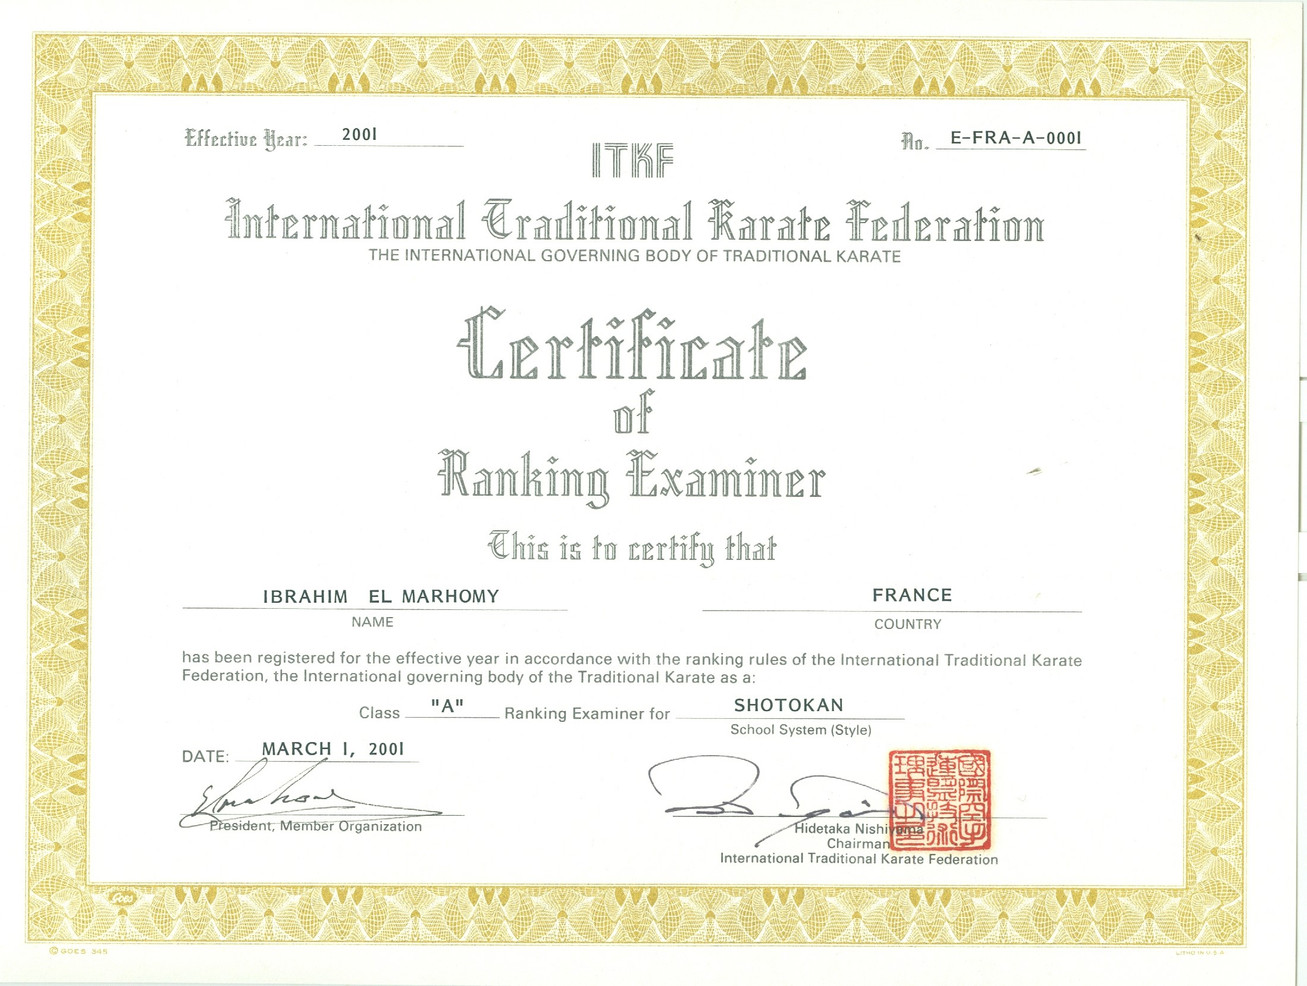 EXAMINATEUR CLASSE A IB 20010001.jpg